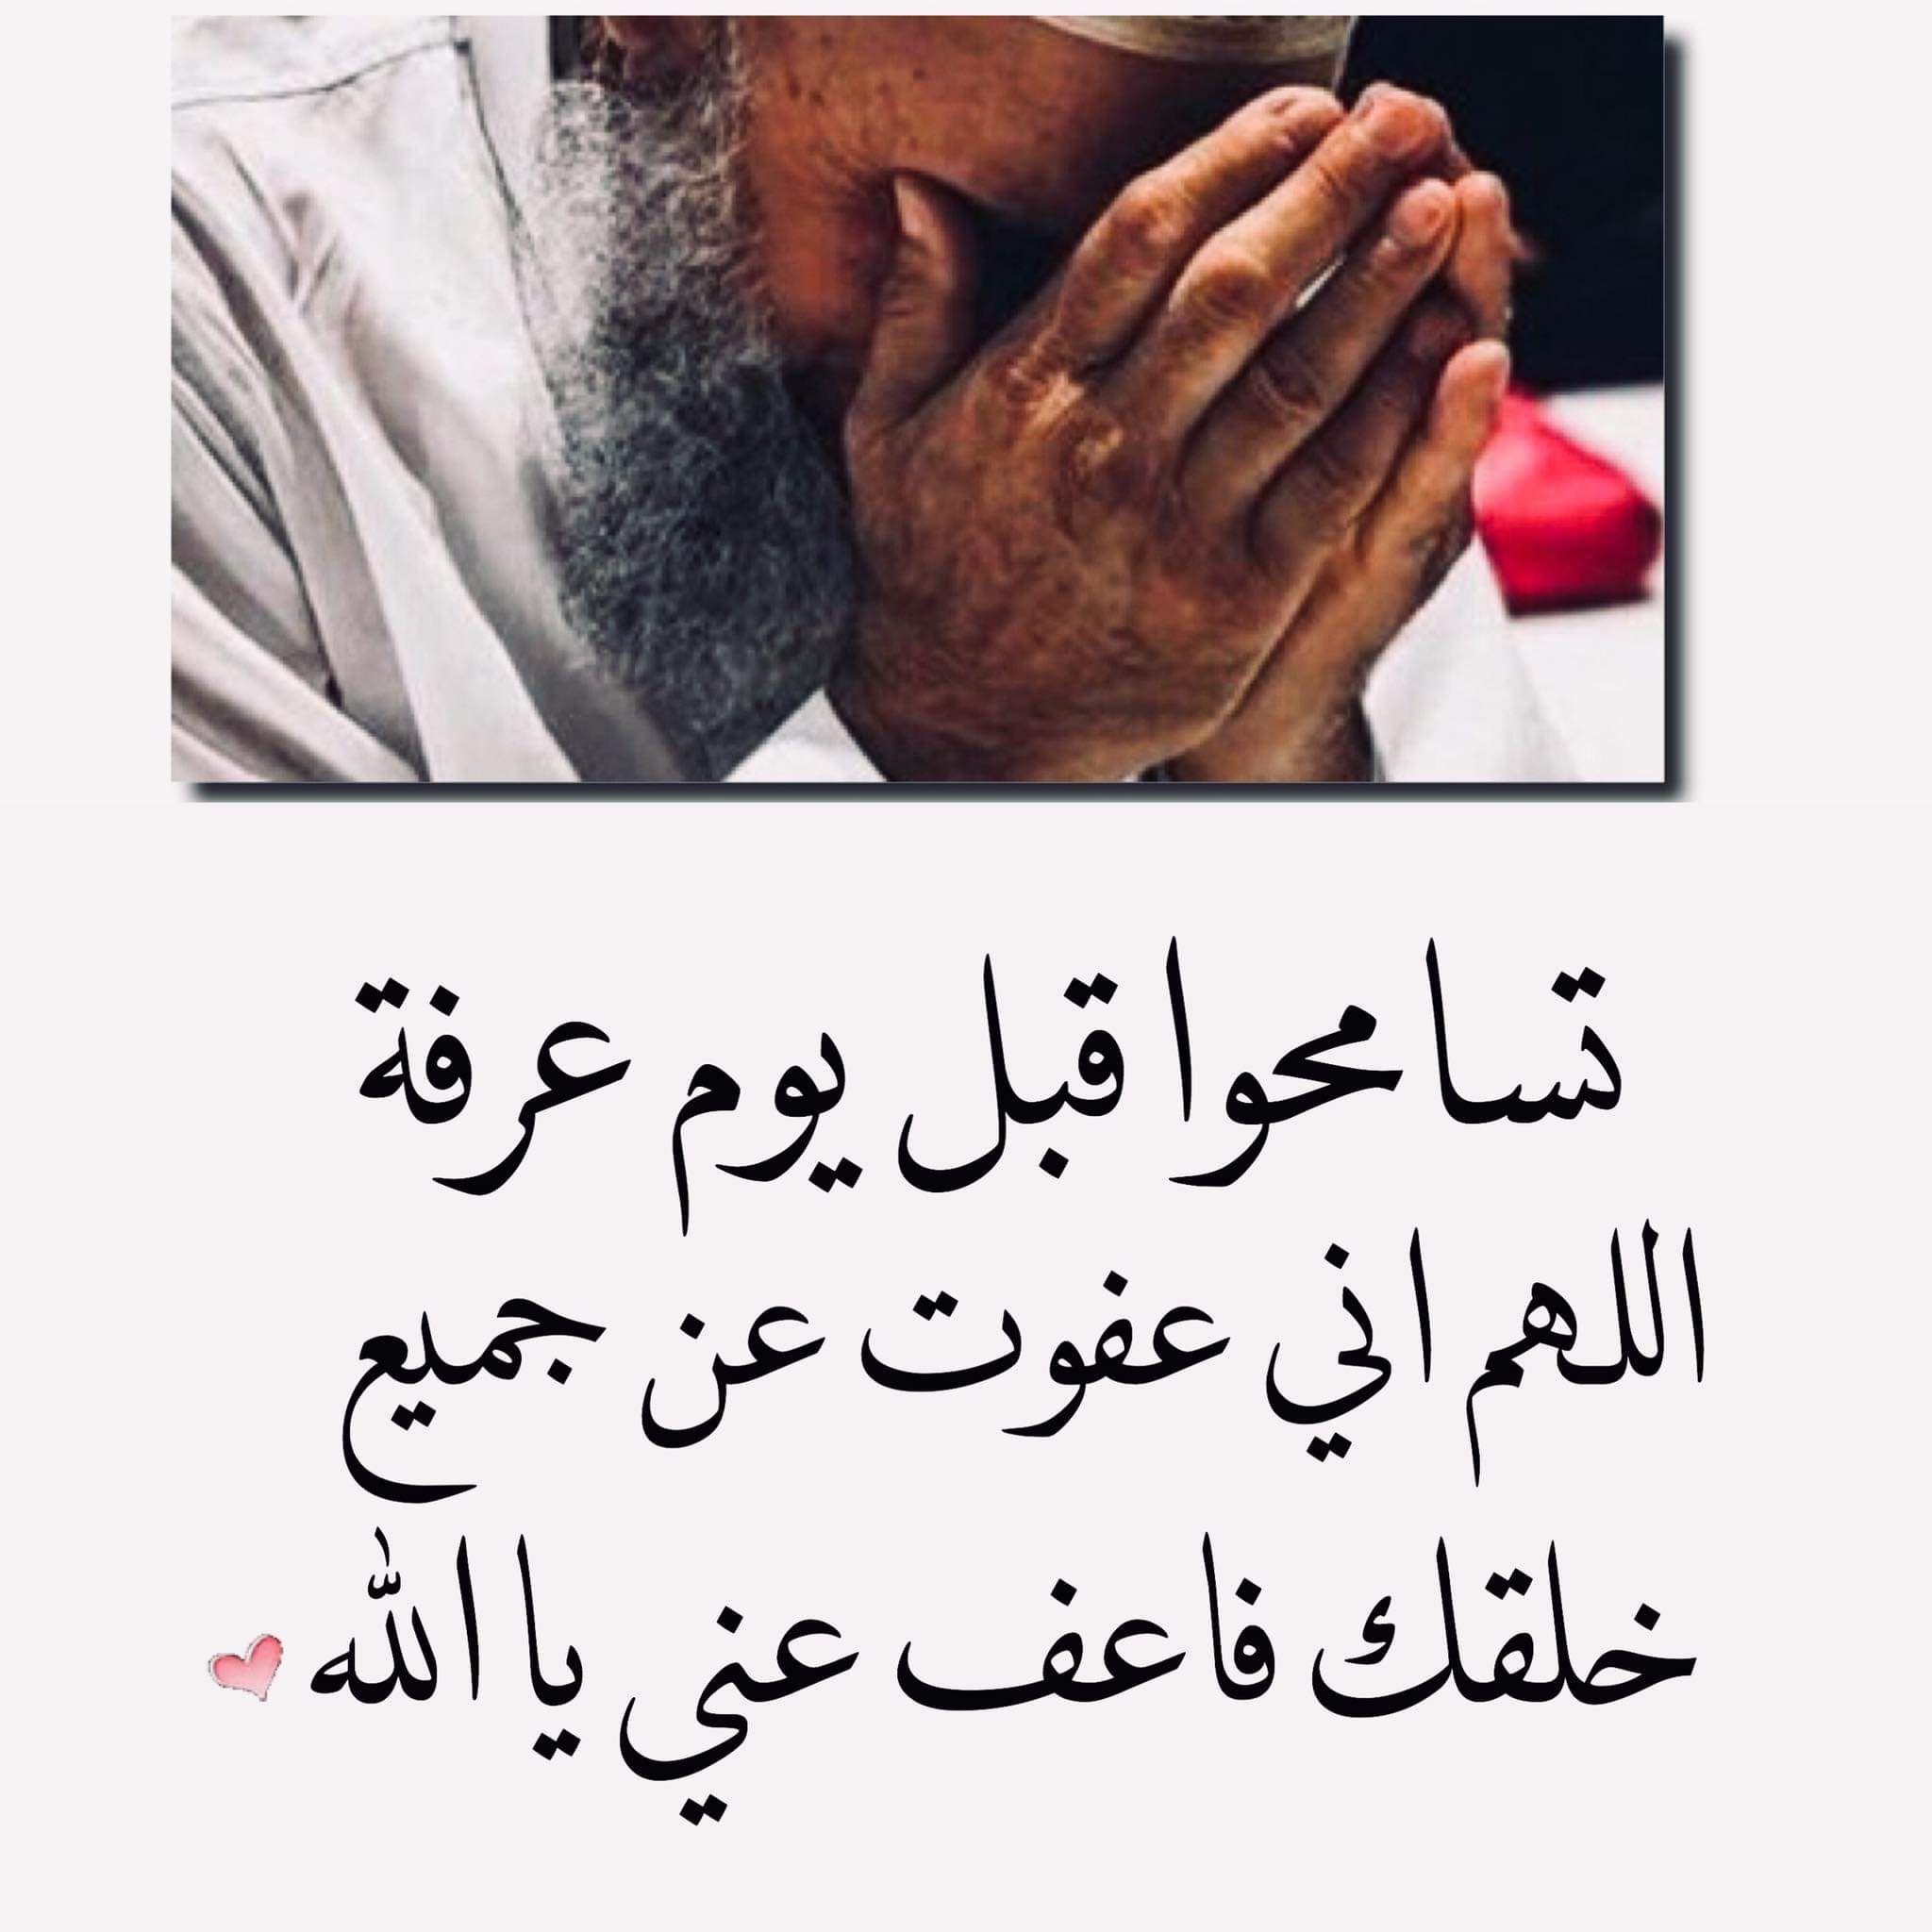 Pin By صورة و كلمة On يوم عرفة Instagram Posts Instagram Islamic Quotes